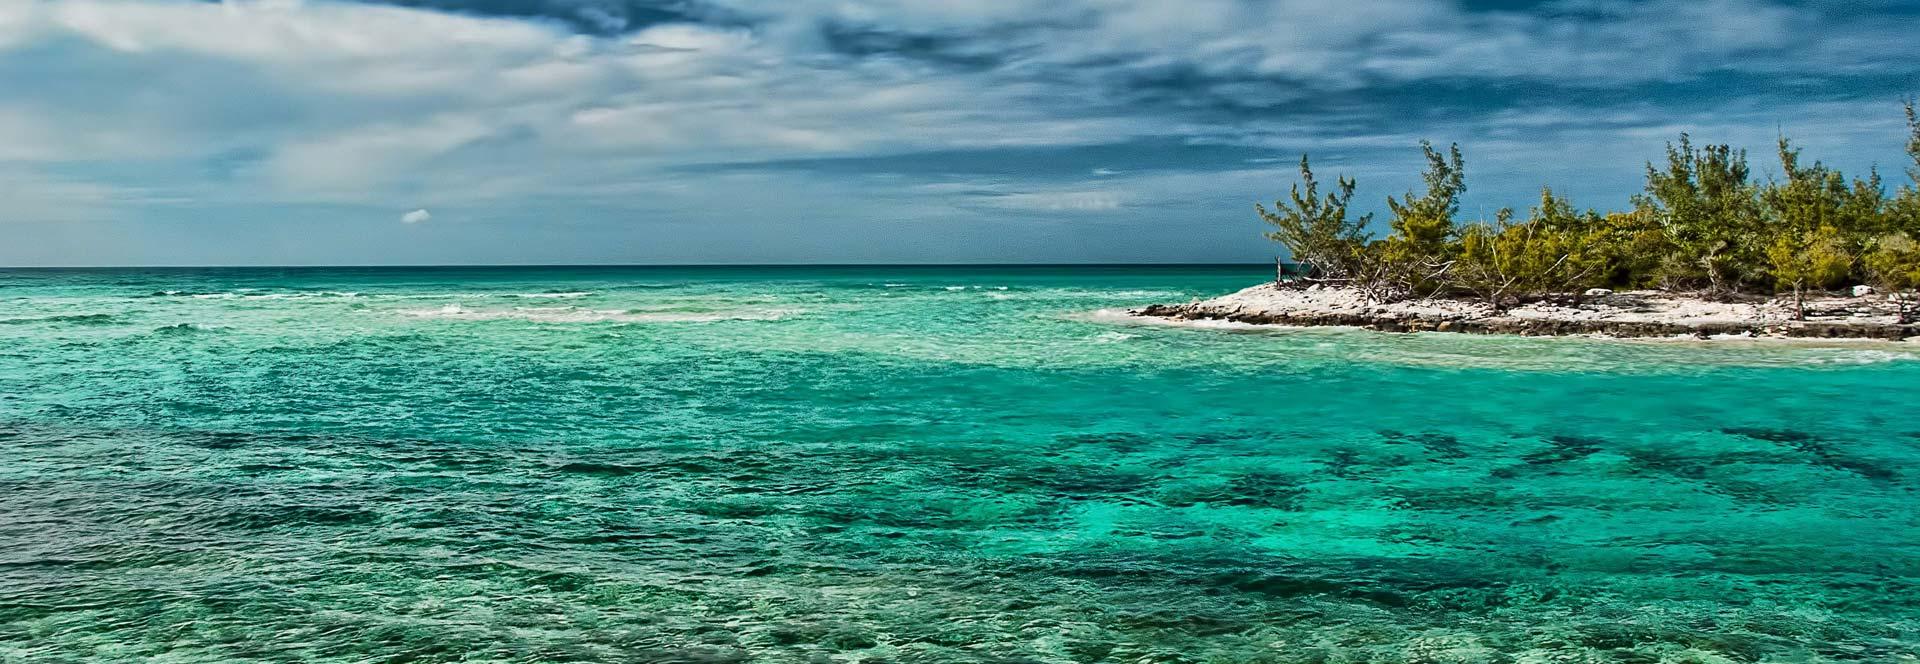 Bahamas vacations. Vacations & vacations in Bahamas in ...